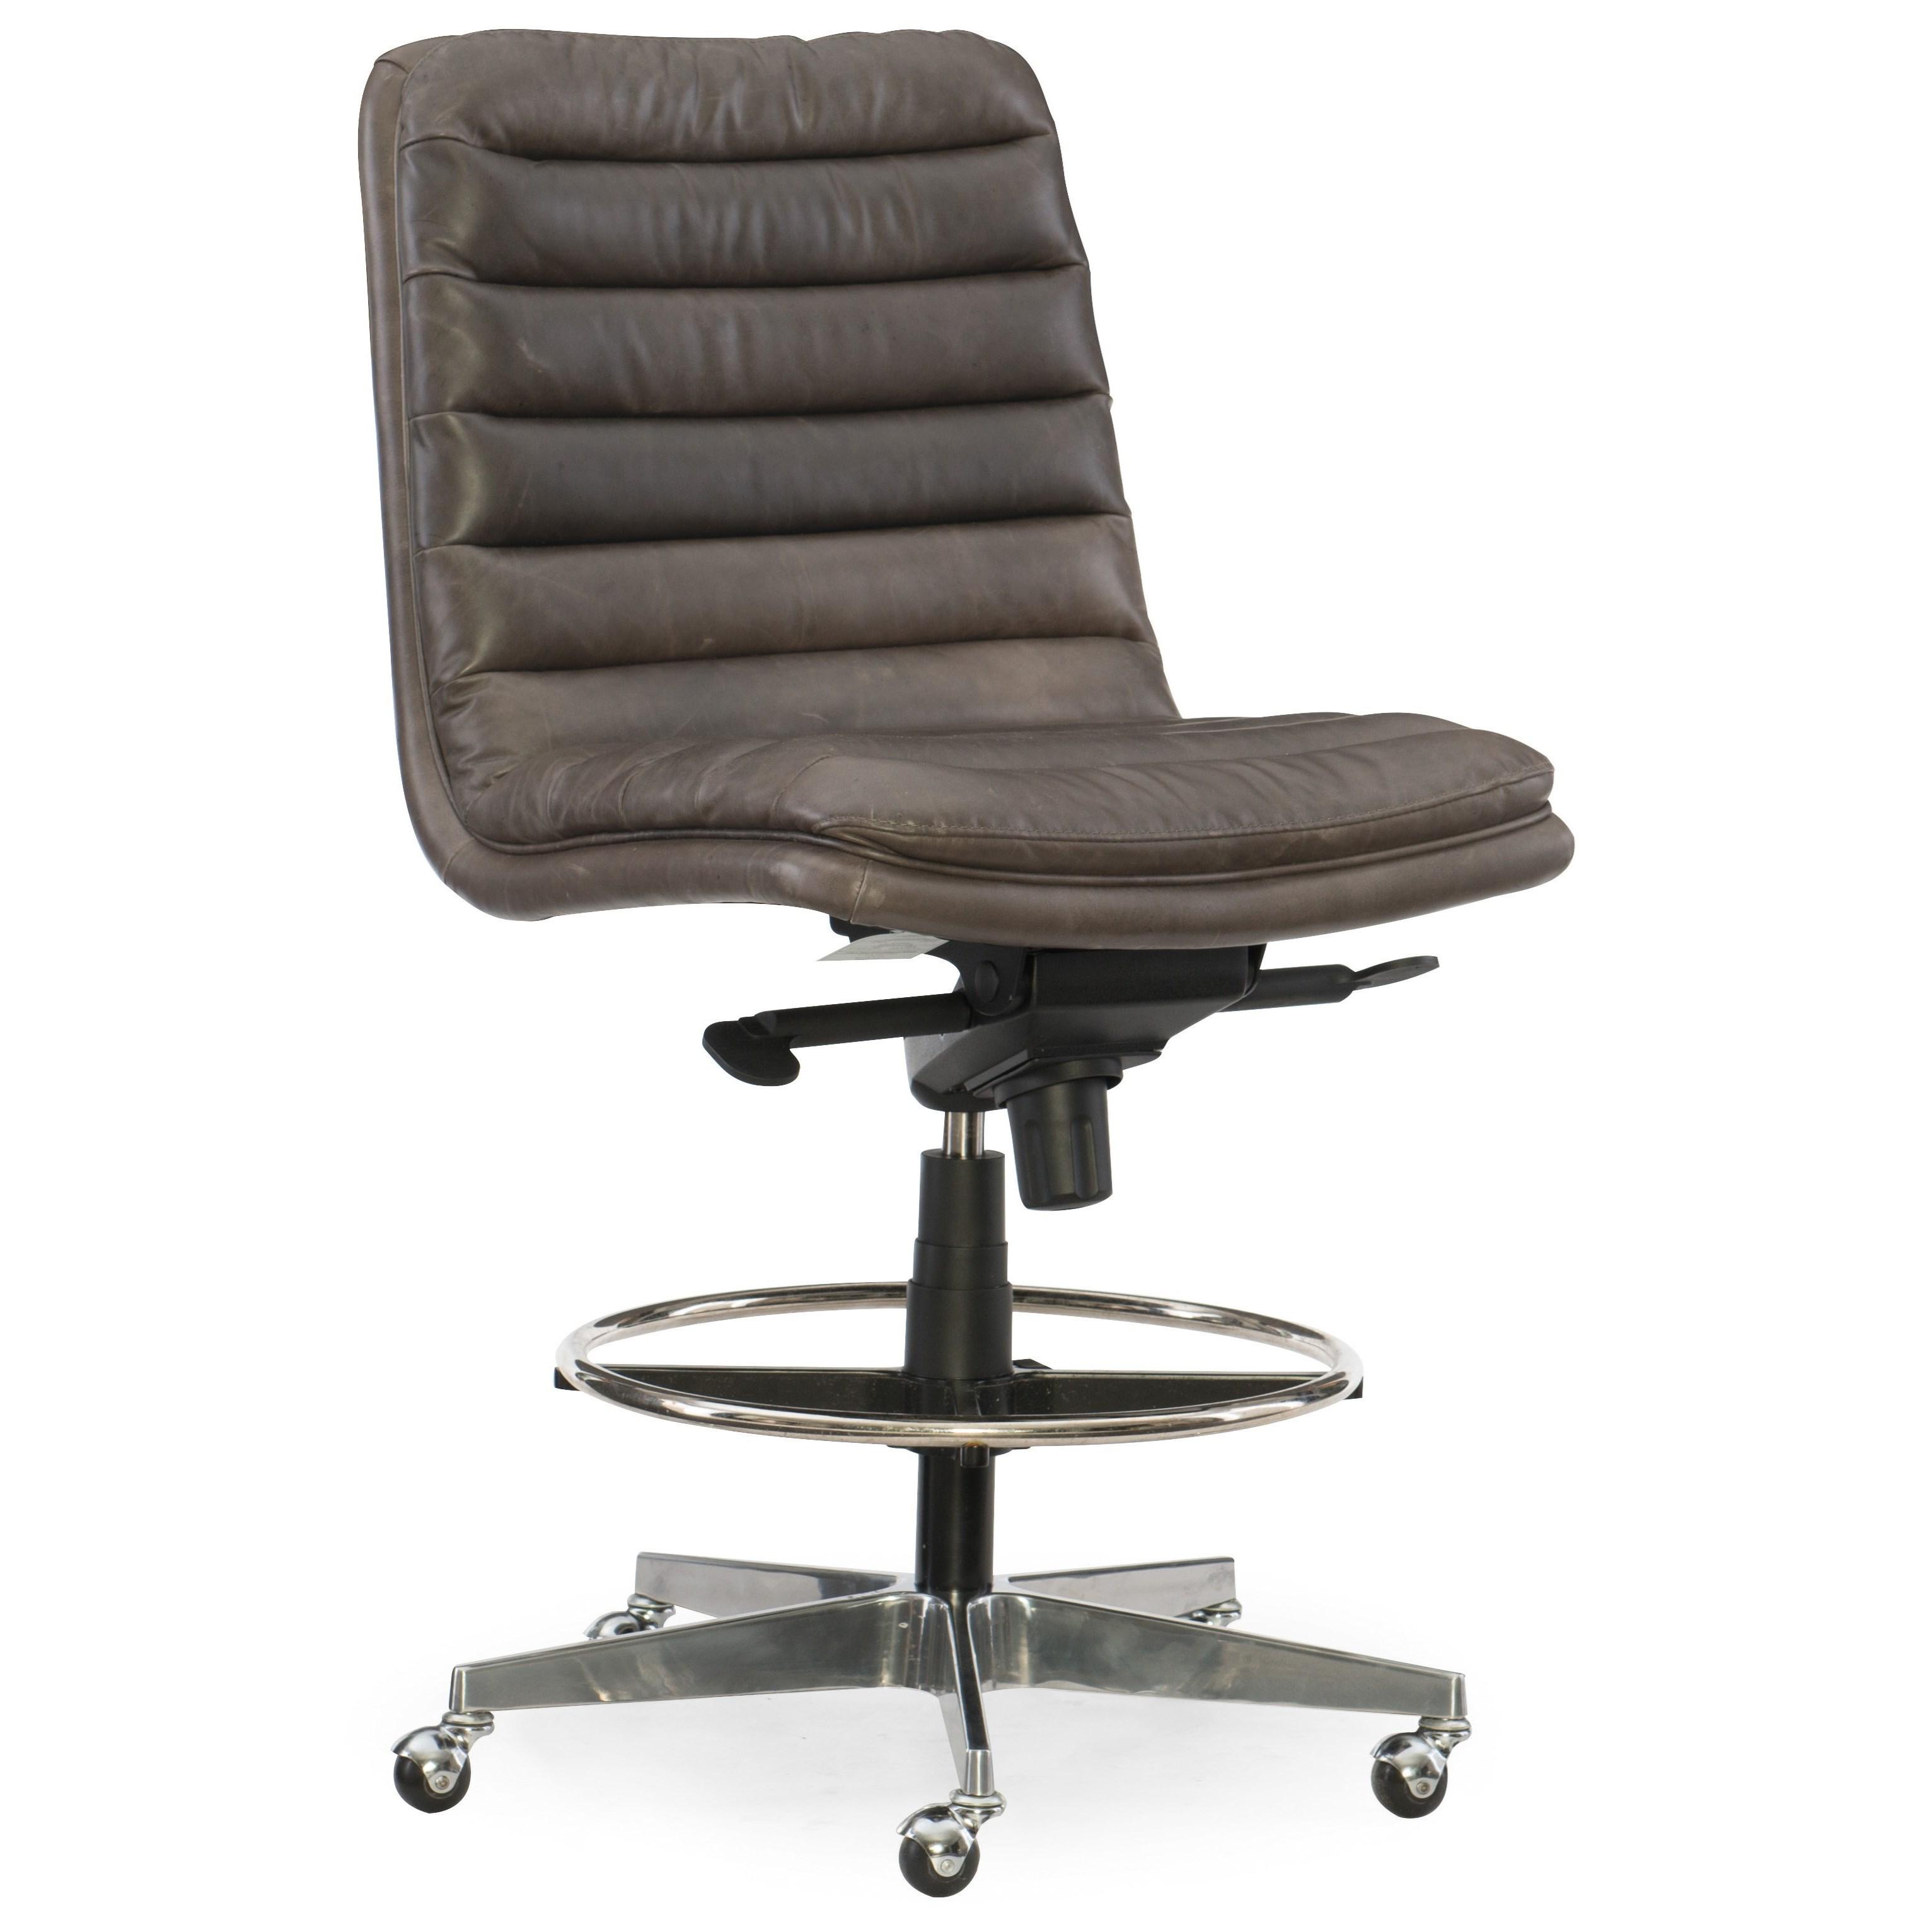 Hooker Furniture Executive Seating EC592 CH 097 Wyatt Home ...